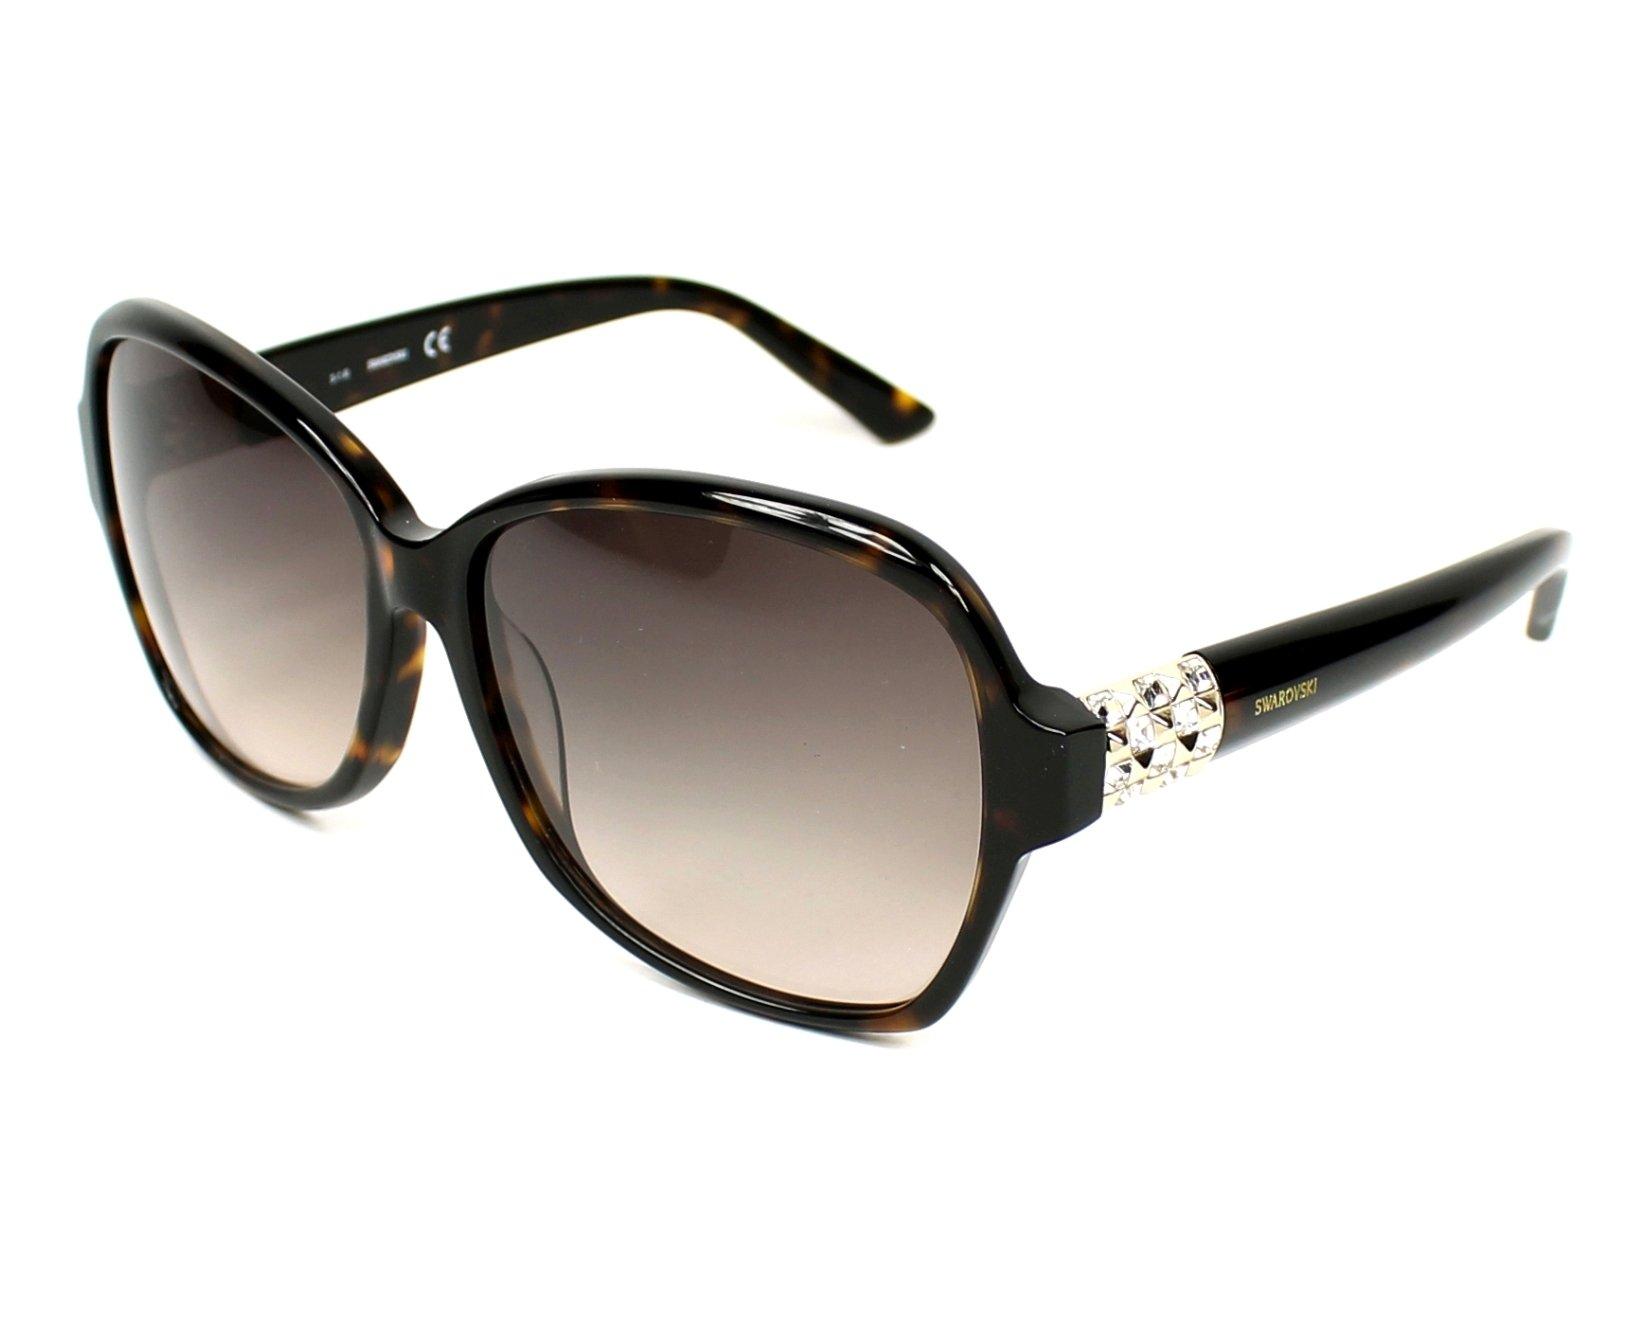 swarovski sunglasses eleven sw88 52f 60 visionet